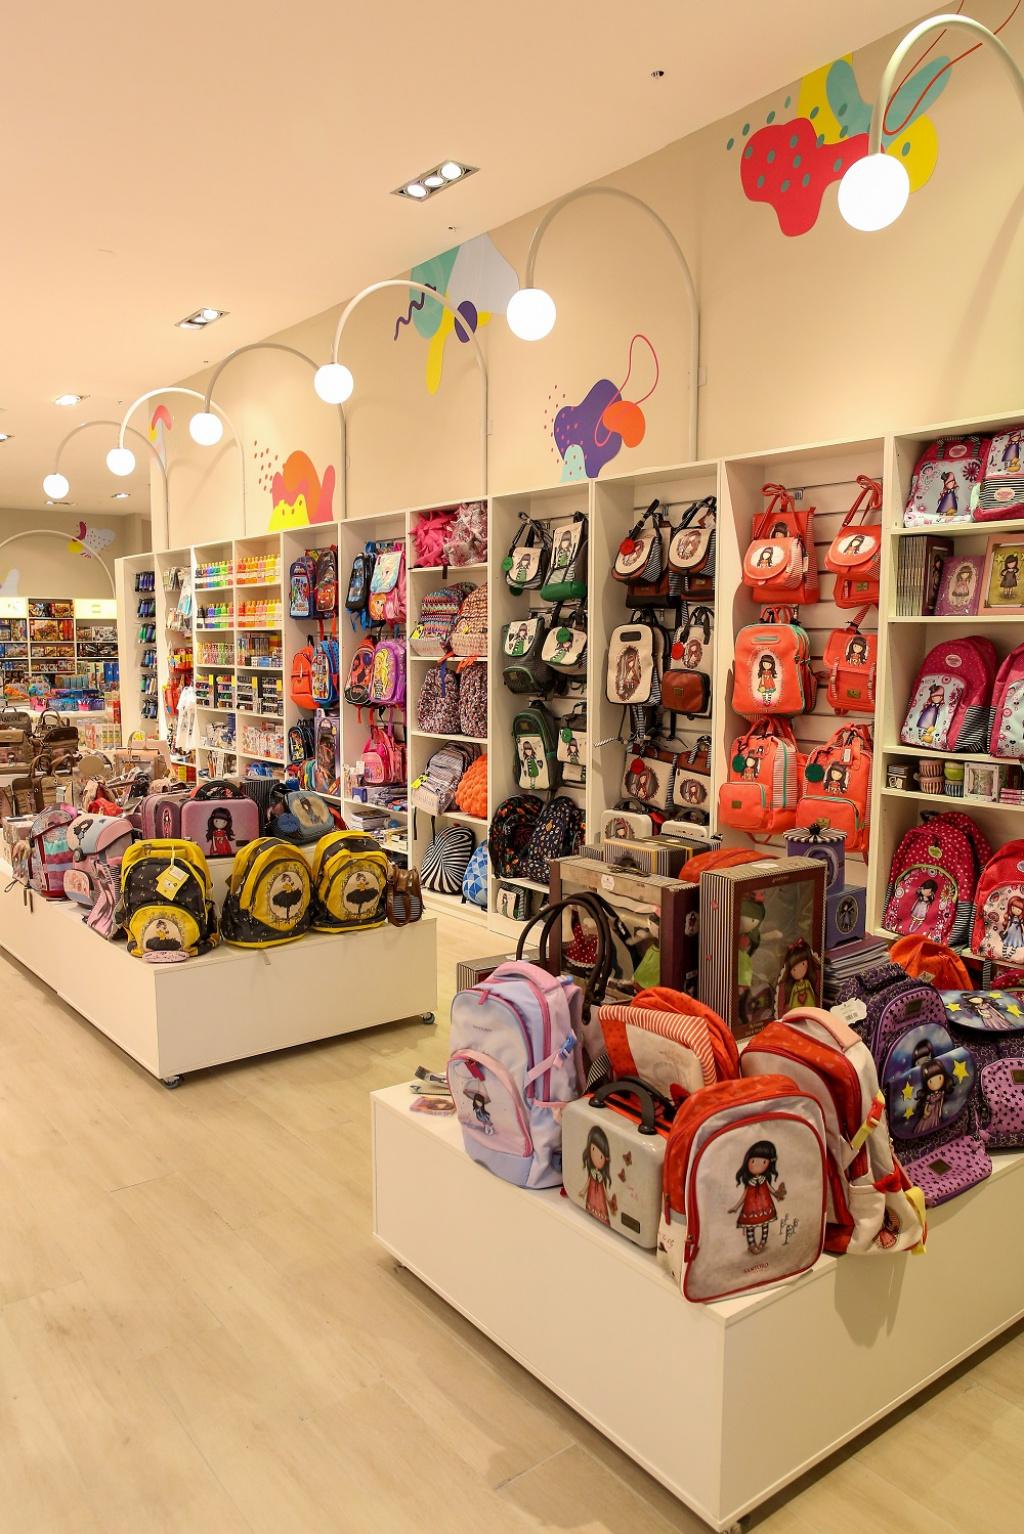 FOTO Cum arata noul concept Diverta din Baneasa Shopping City. Investitie de 200.000 de euro in rebranding - Foto 3 din 16